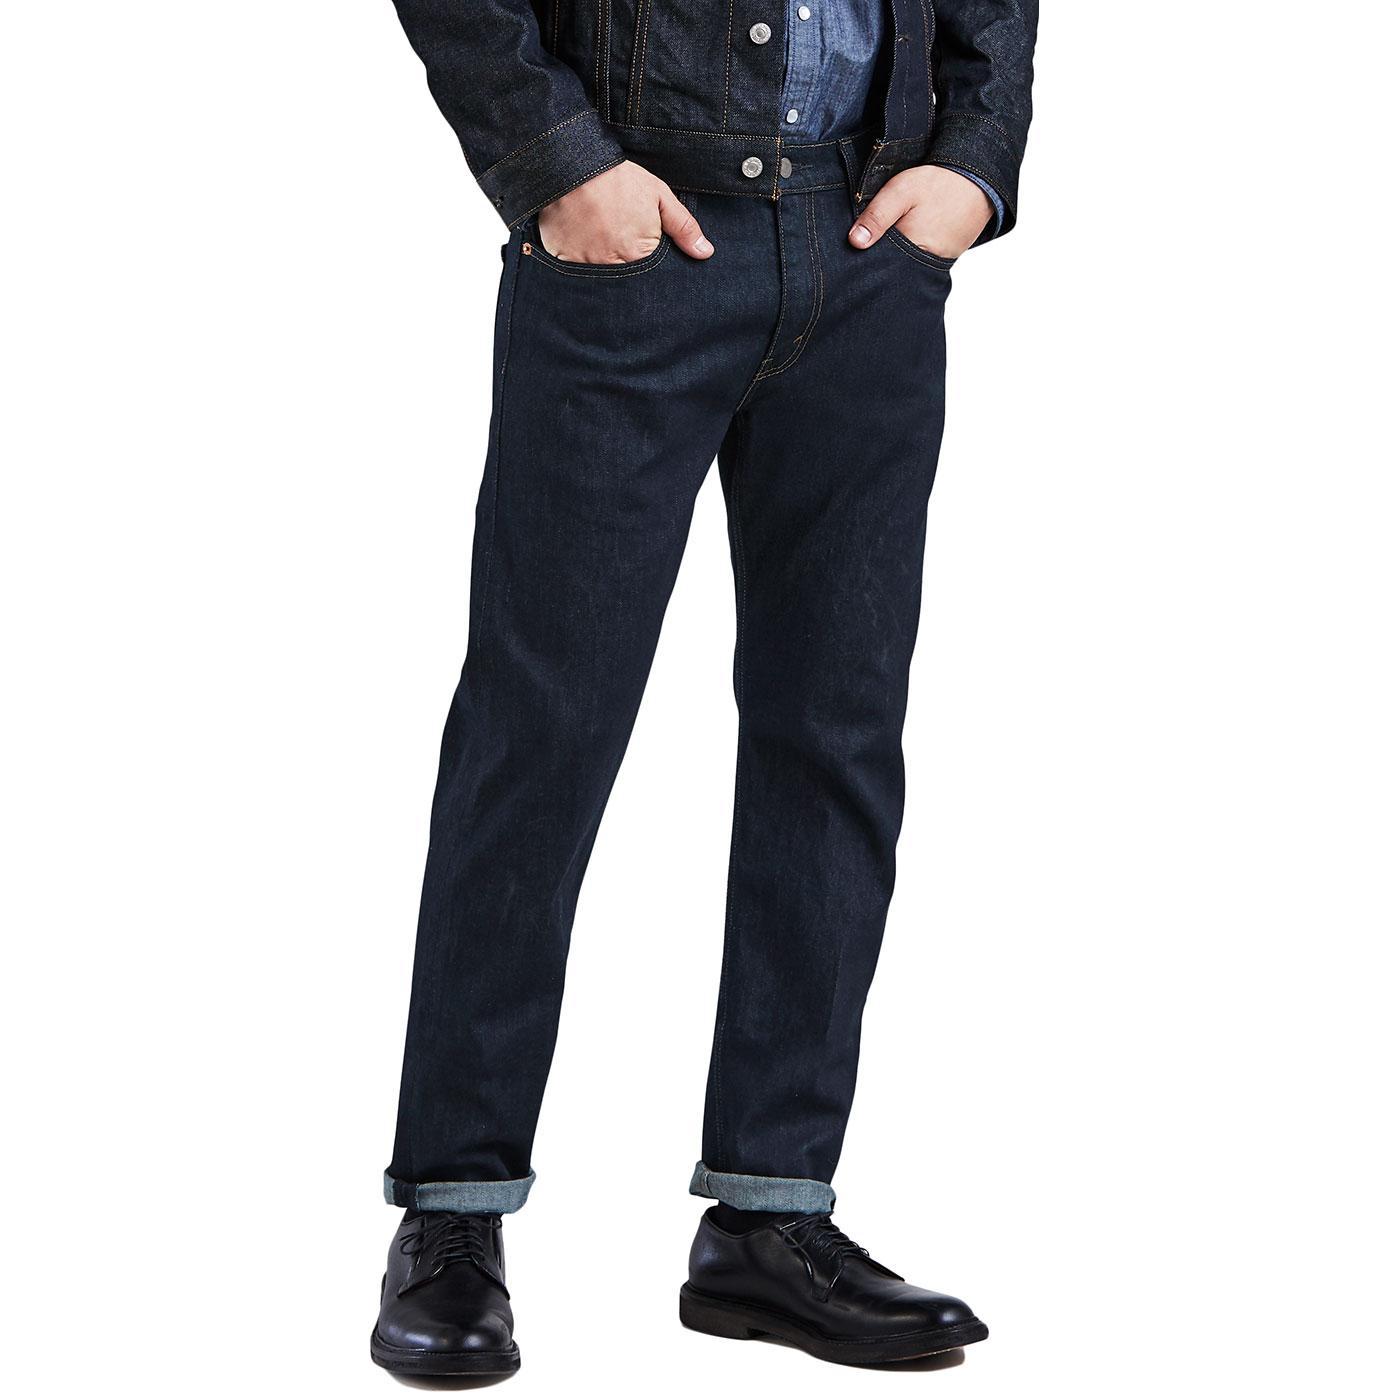 LEVI'S 502 Regular Taper Jeans (Midnight Carbon)